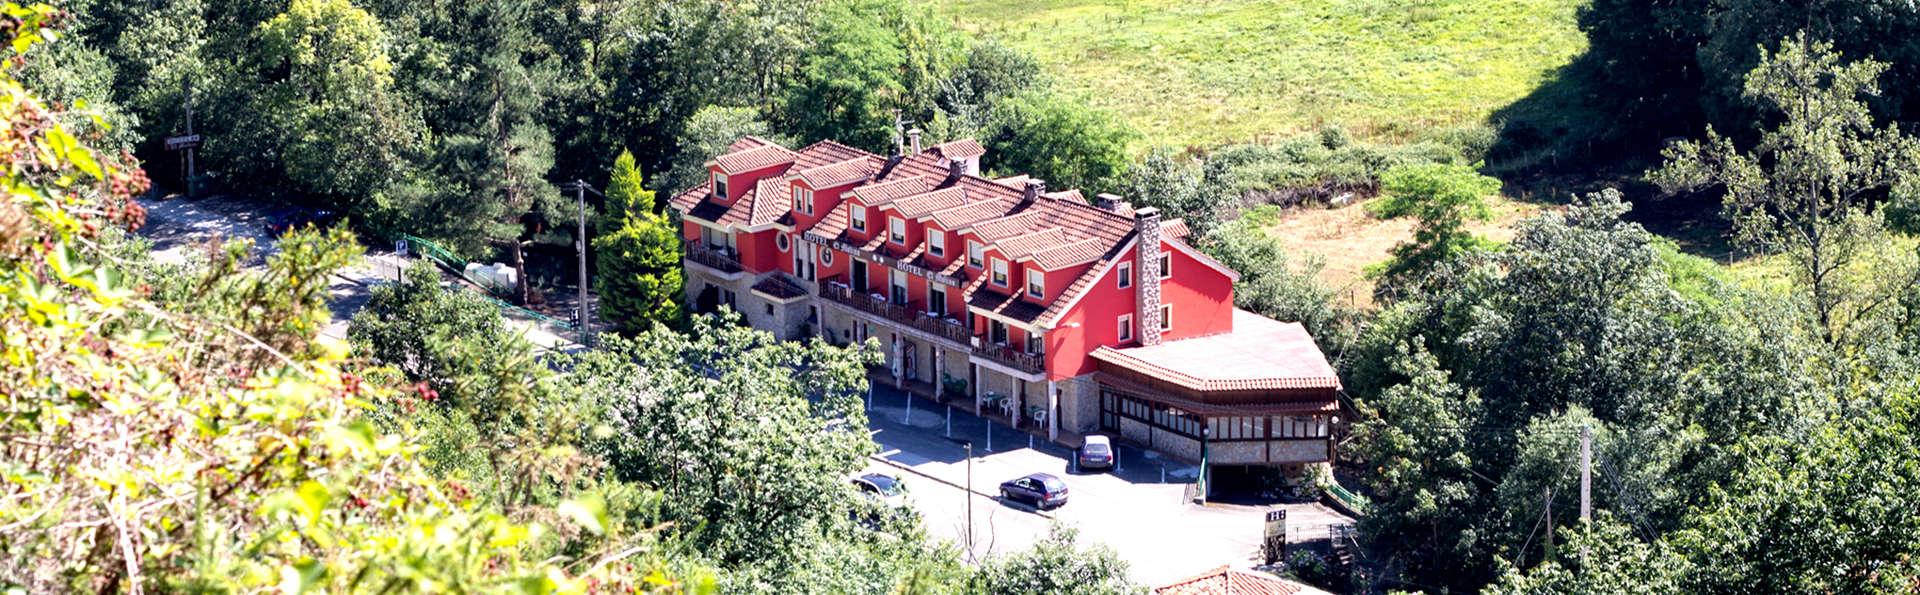 Hotel Rural El Molino - Edit_Frotn.jpg